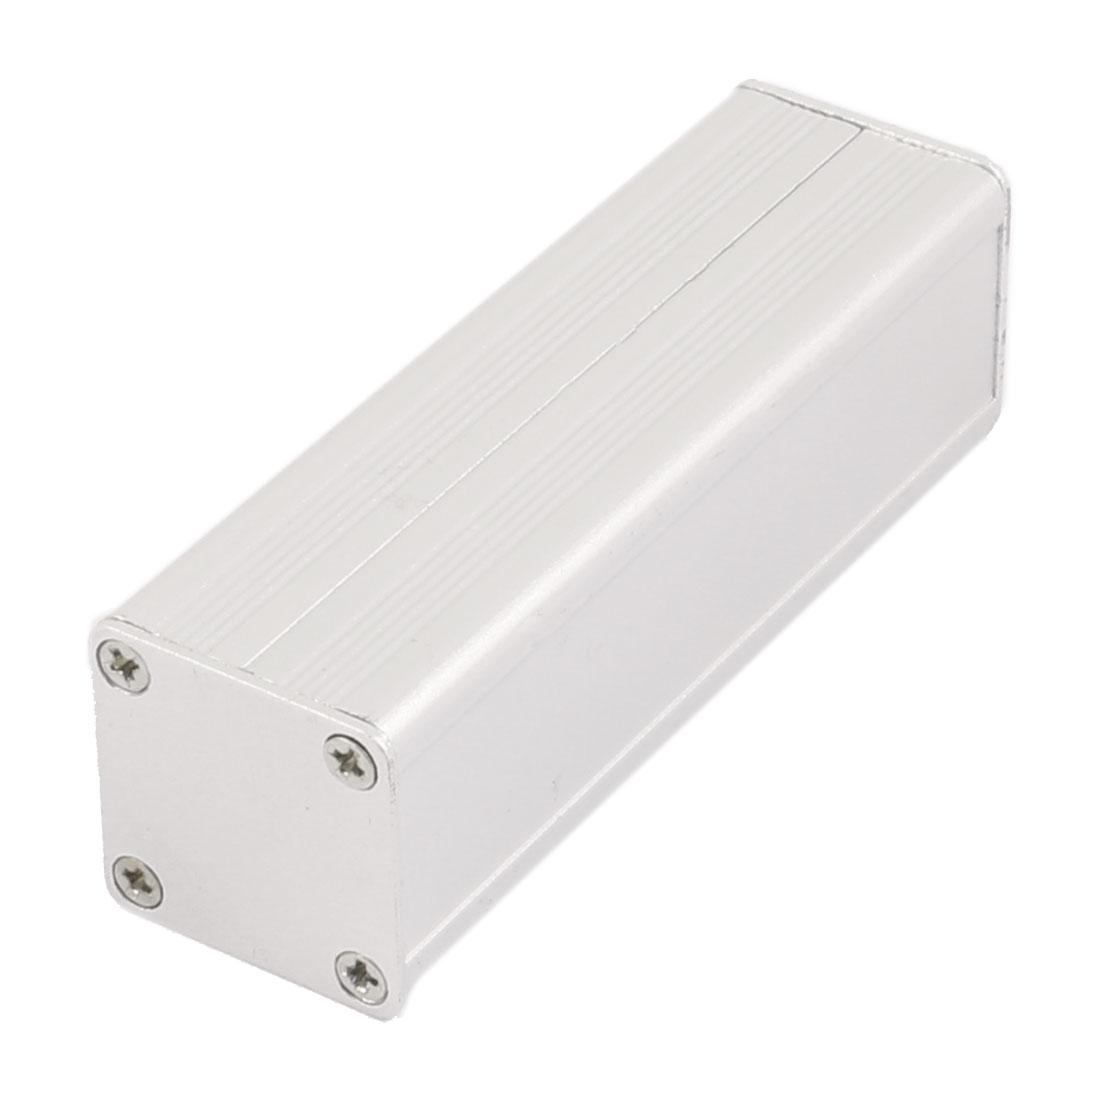 83 x 25 x 25mm Multi-purpose Electronic Extruded Aluminum Enclosure Case Silver Tone